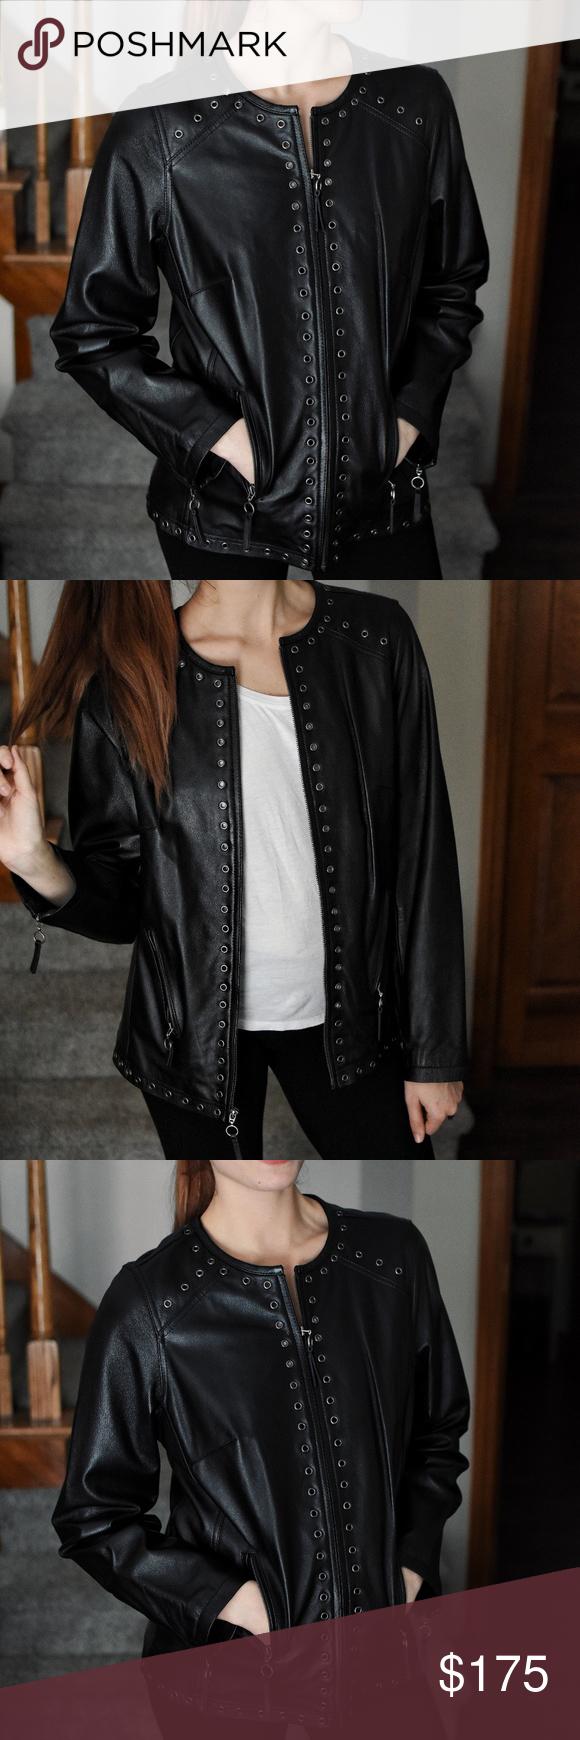 SALE! Bradley Bayou Genuine Leather Jacket Clothes